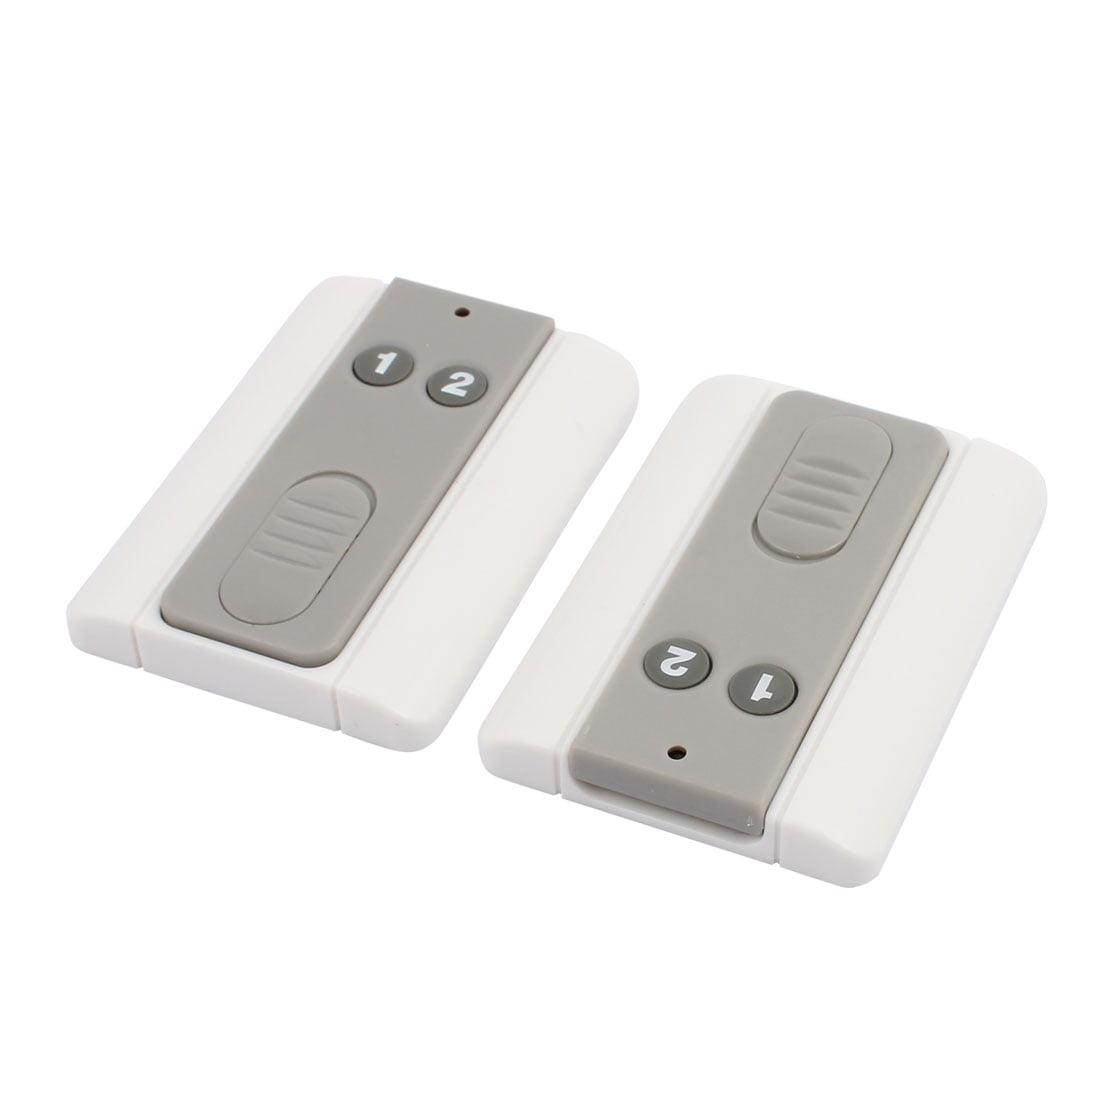 2pcs 100 Meters 2 Keys Plastic Shell Battery Powered Remote Controller w Base - image 1 de 3